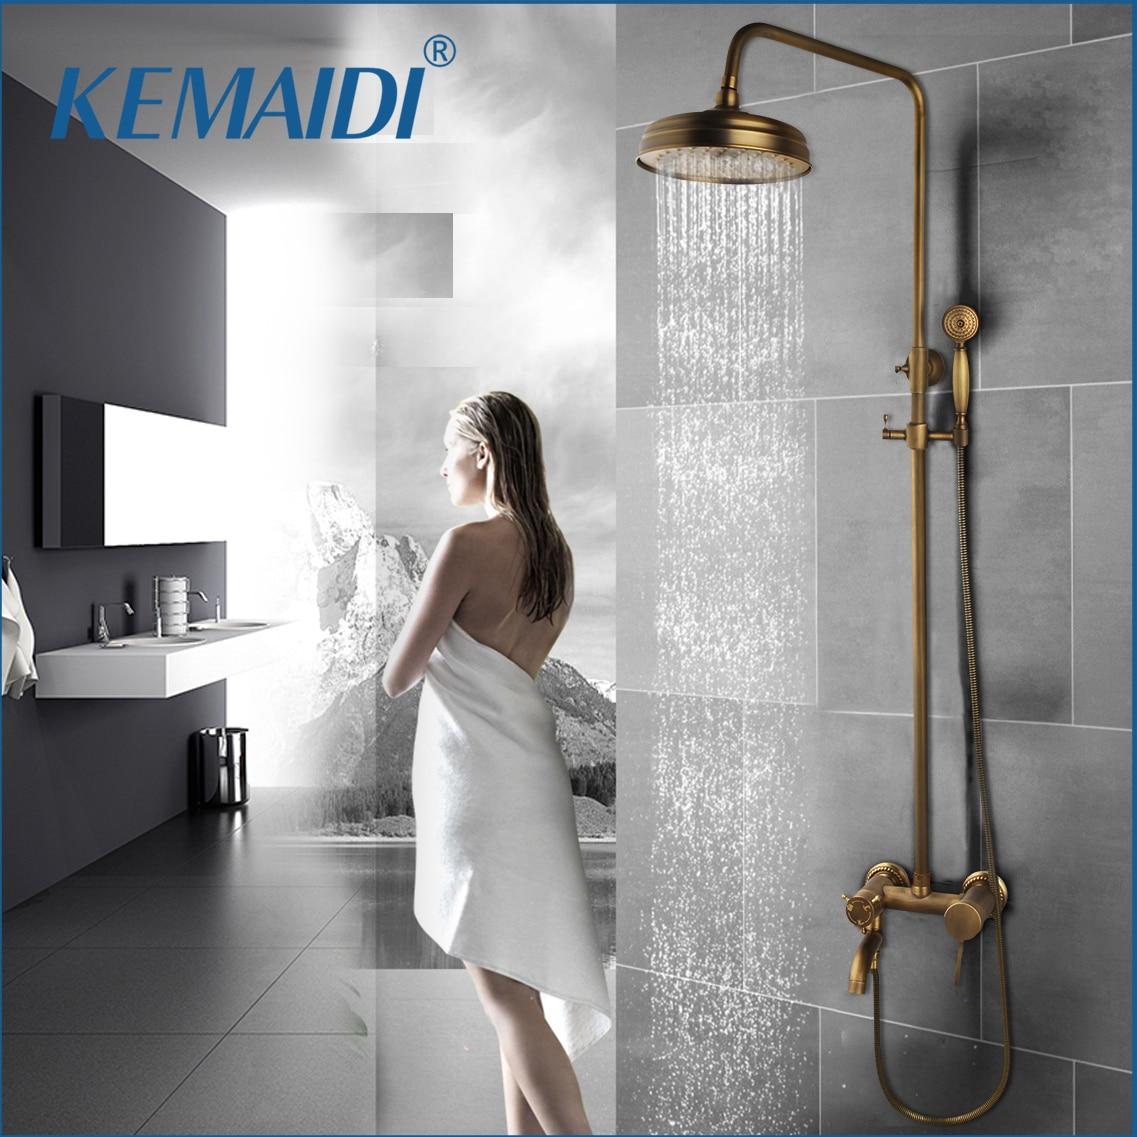 KEMAIDI-مجموعة دش الحمام النحاسية العتيقة ، ودش يدوي ومستدير ، وحنفيات خلاط بمقابض مزدوجة